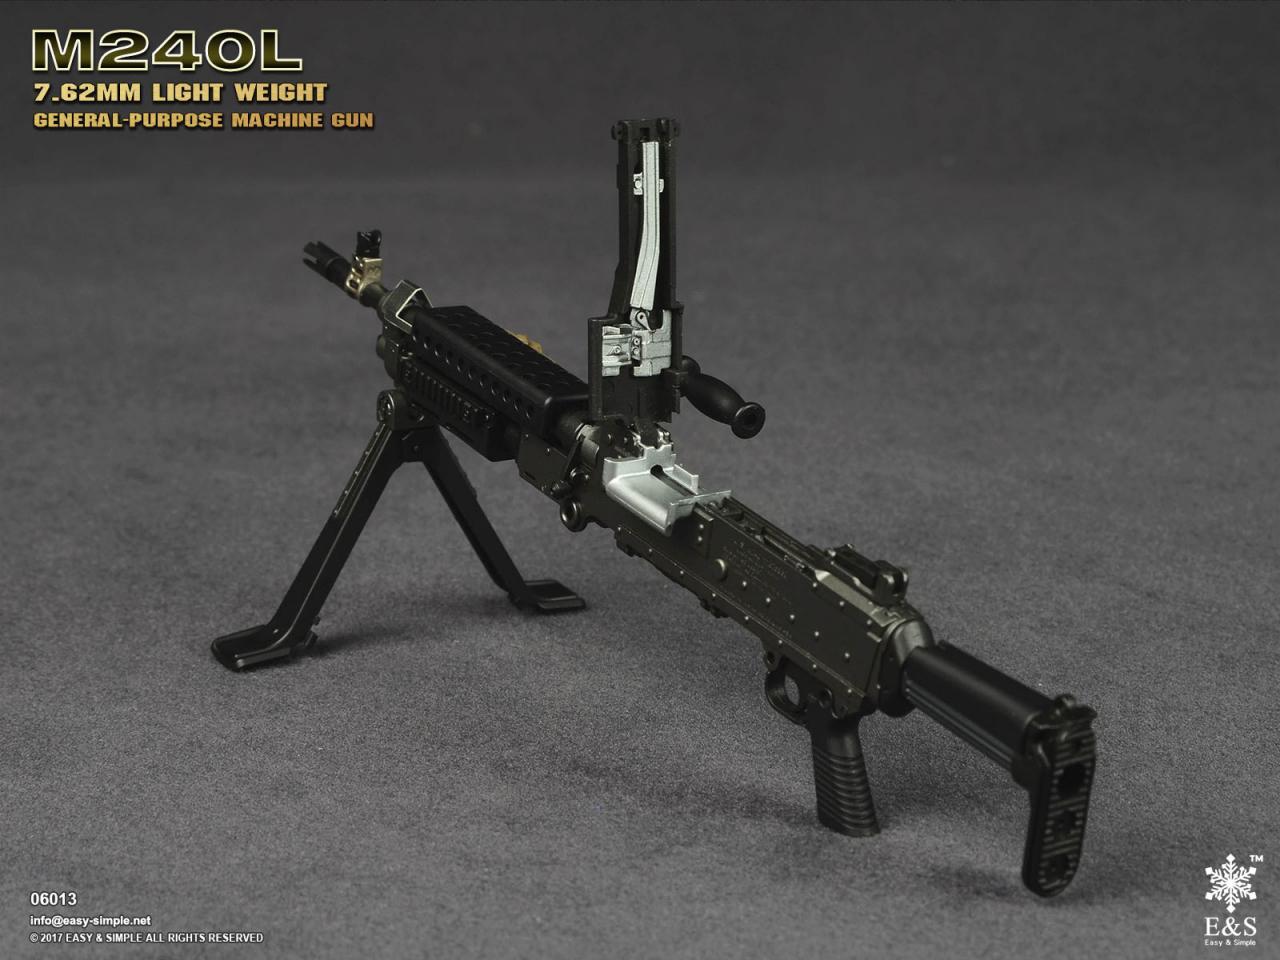 Easy&Simple 06013 M240L 7.62mm Light Weight General Purpose Machine Gun-06013-9-jpg